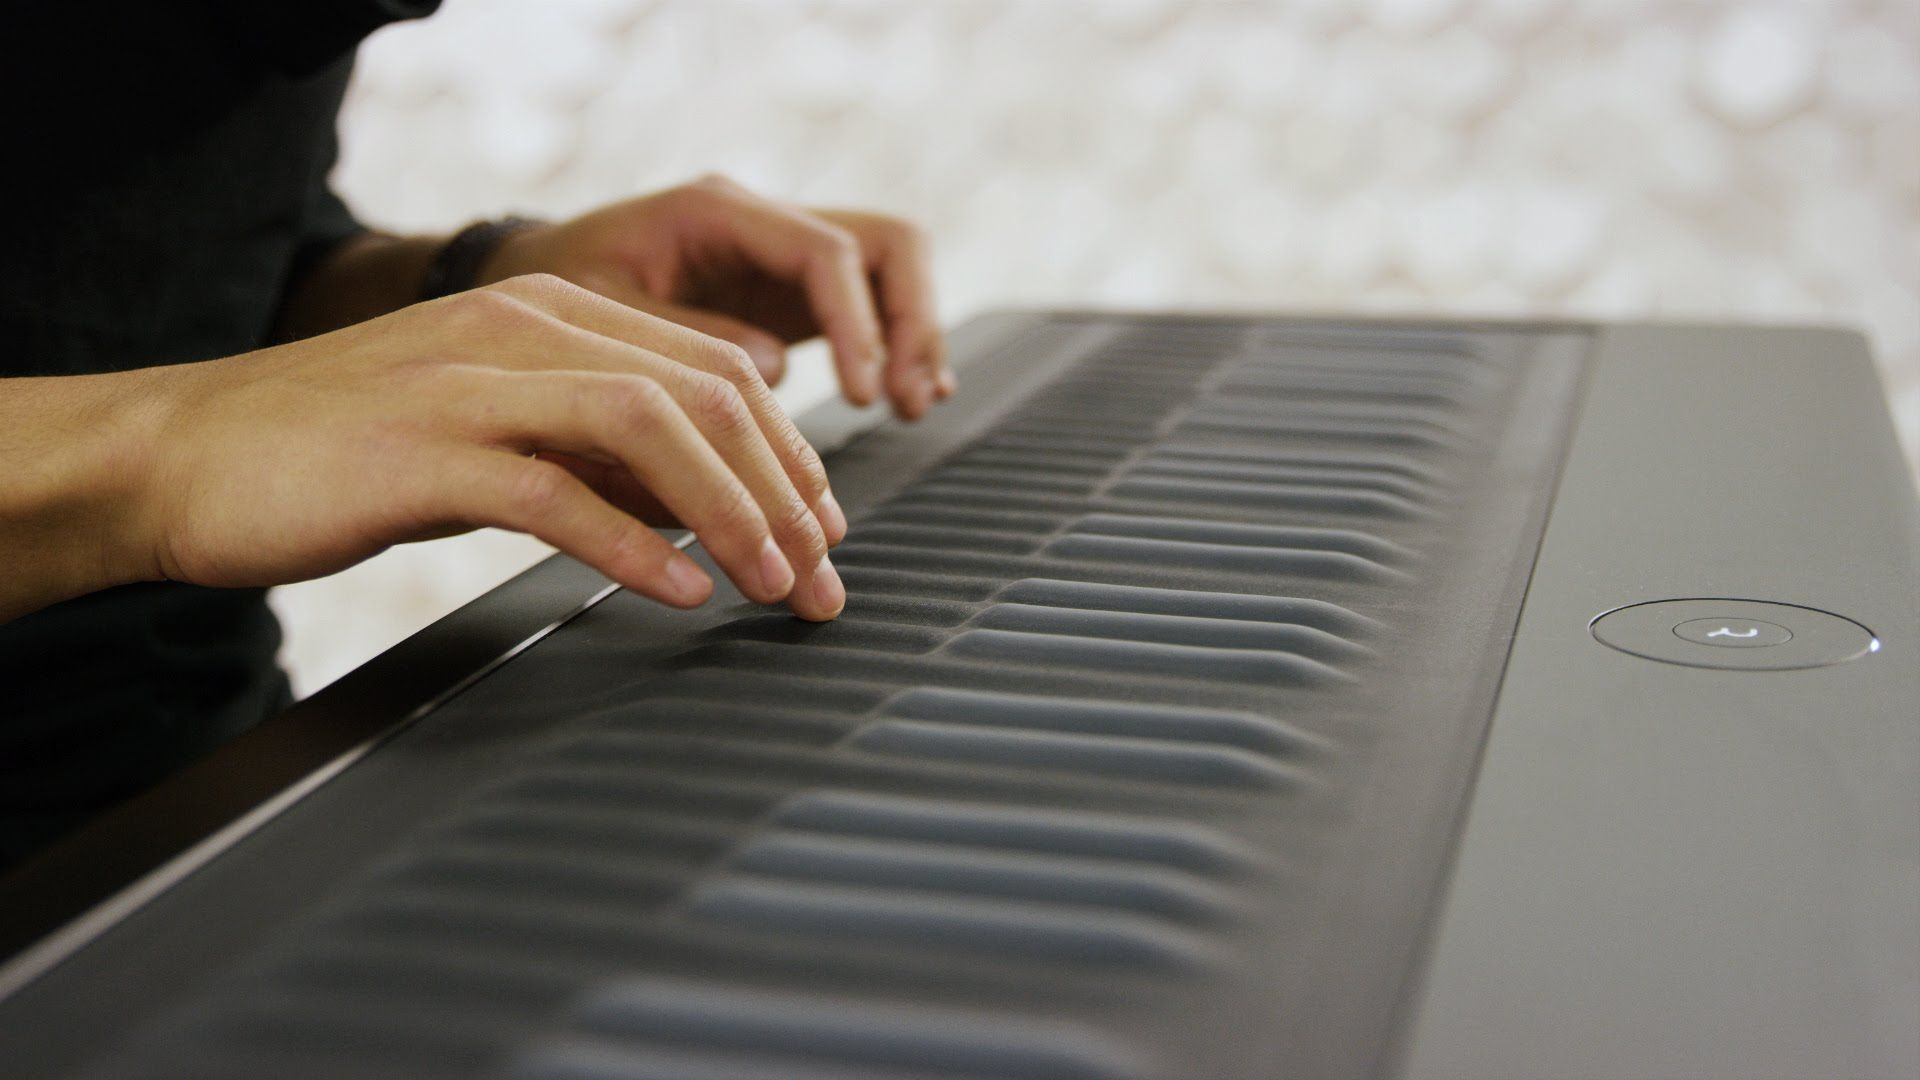 Multitrack Seaboard Grand Performance Musikinstrumente Flut Musik